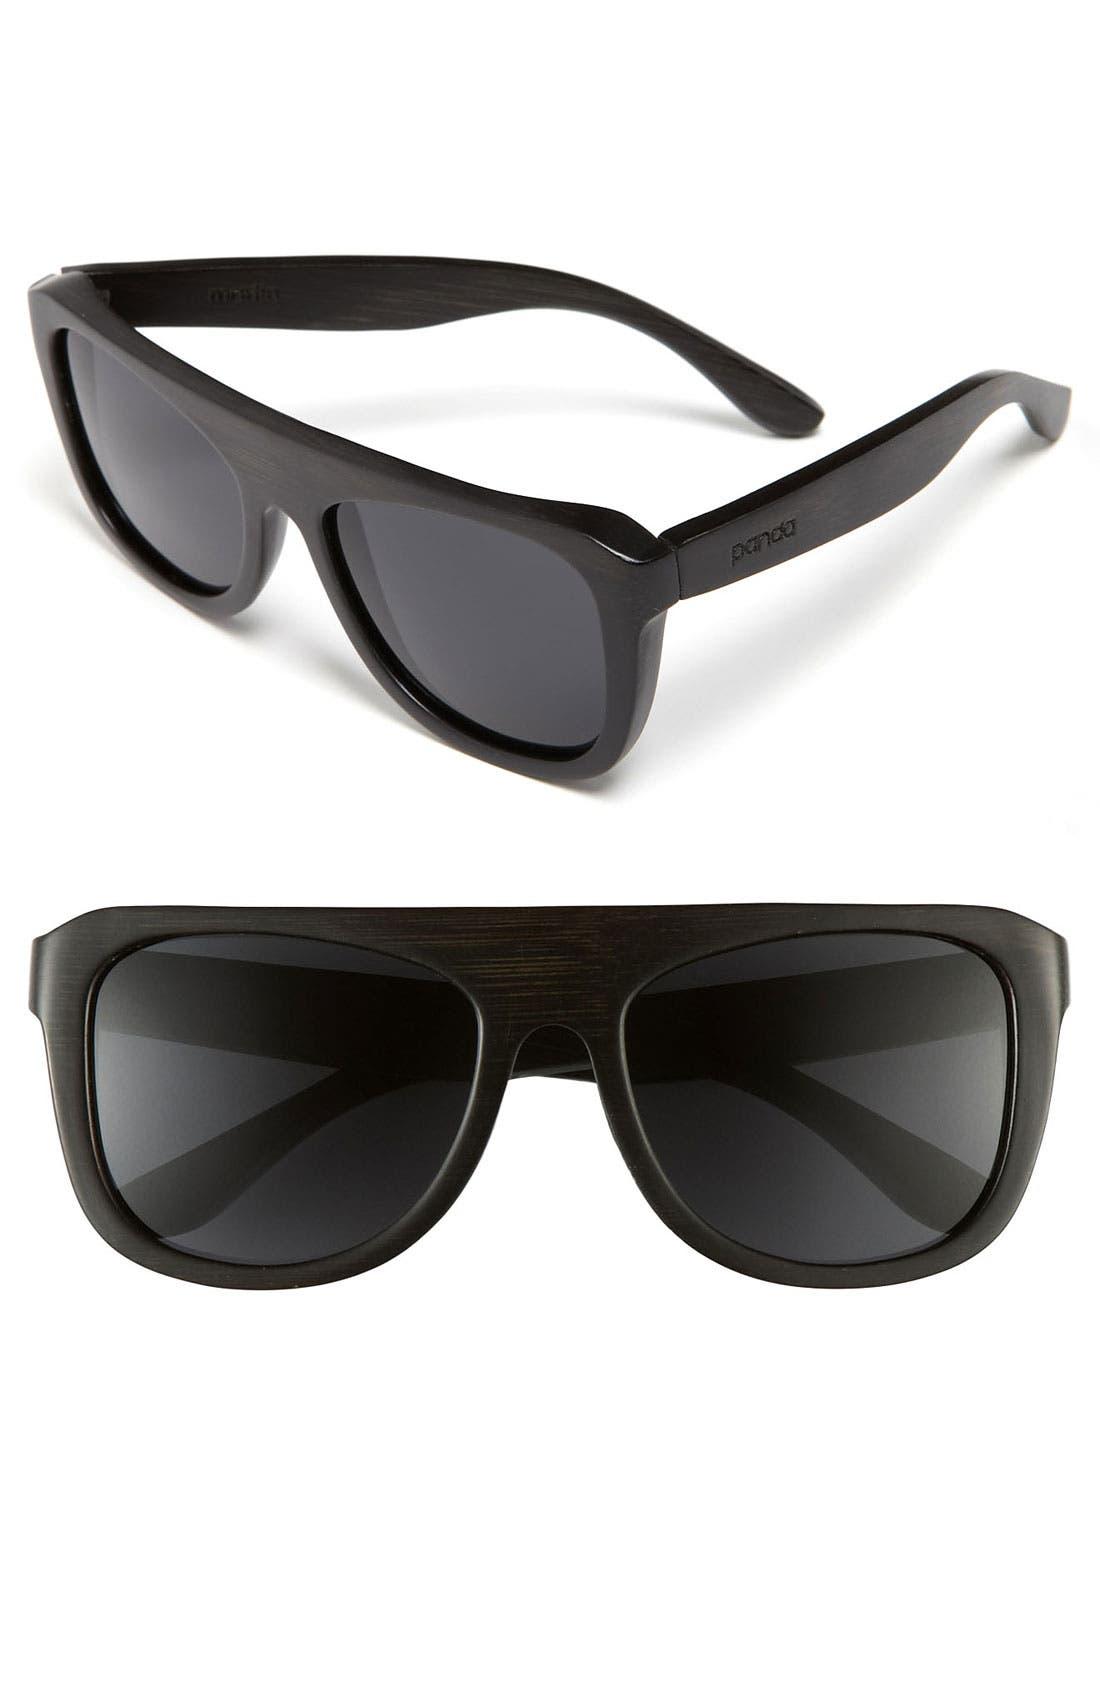 Main Image - Panda™ 'Martin' Sunglasses